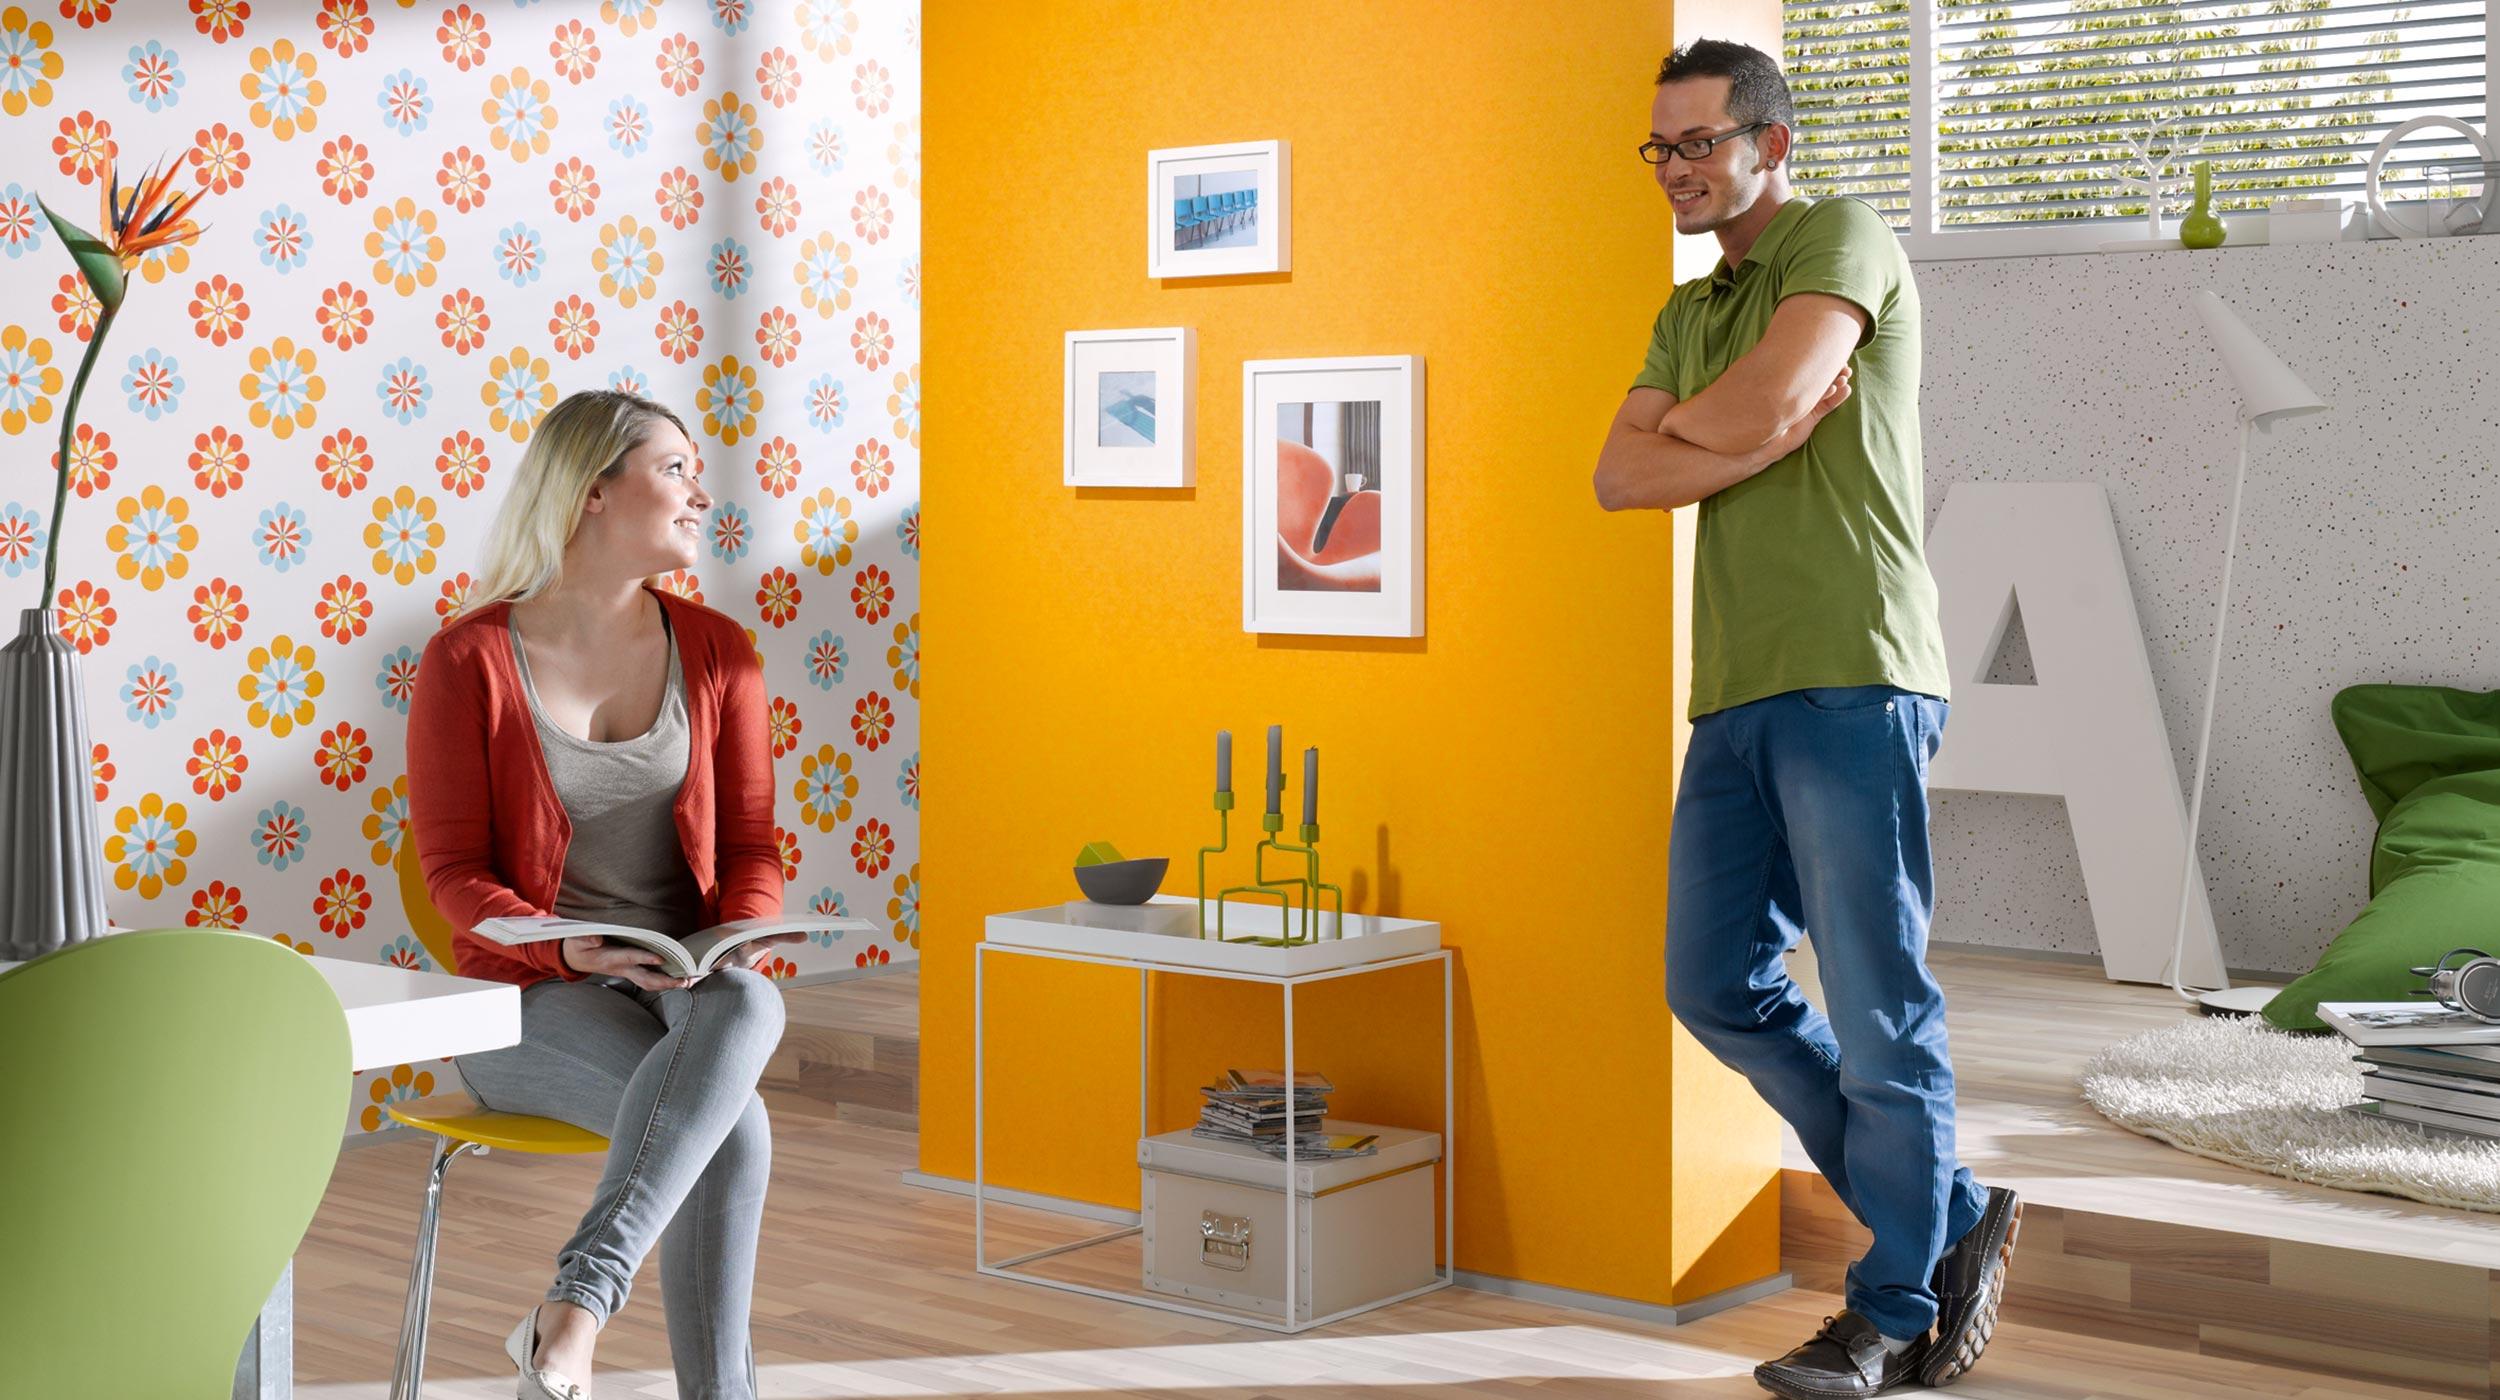 fantasia retro tapeten erismann 5 jpg erismann cie gmbh. Black Bedroom Furniture Sets. Home Design Ideas